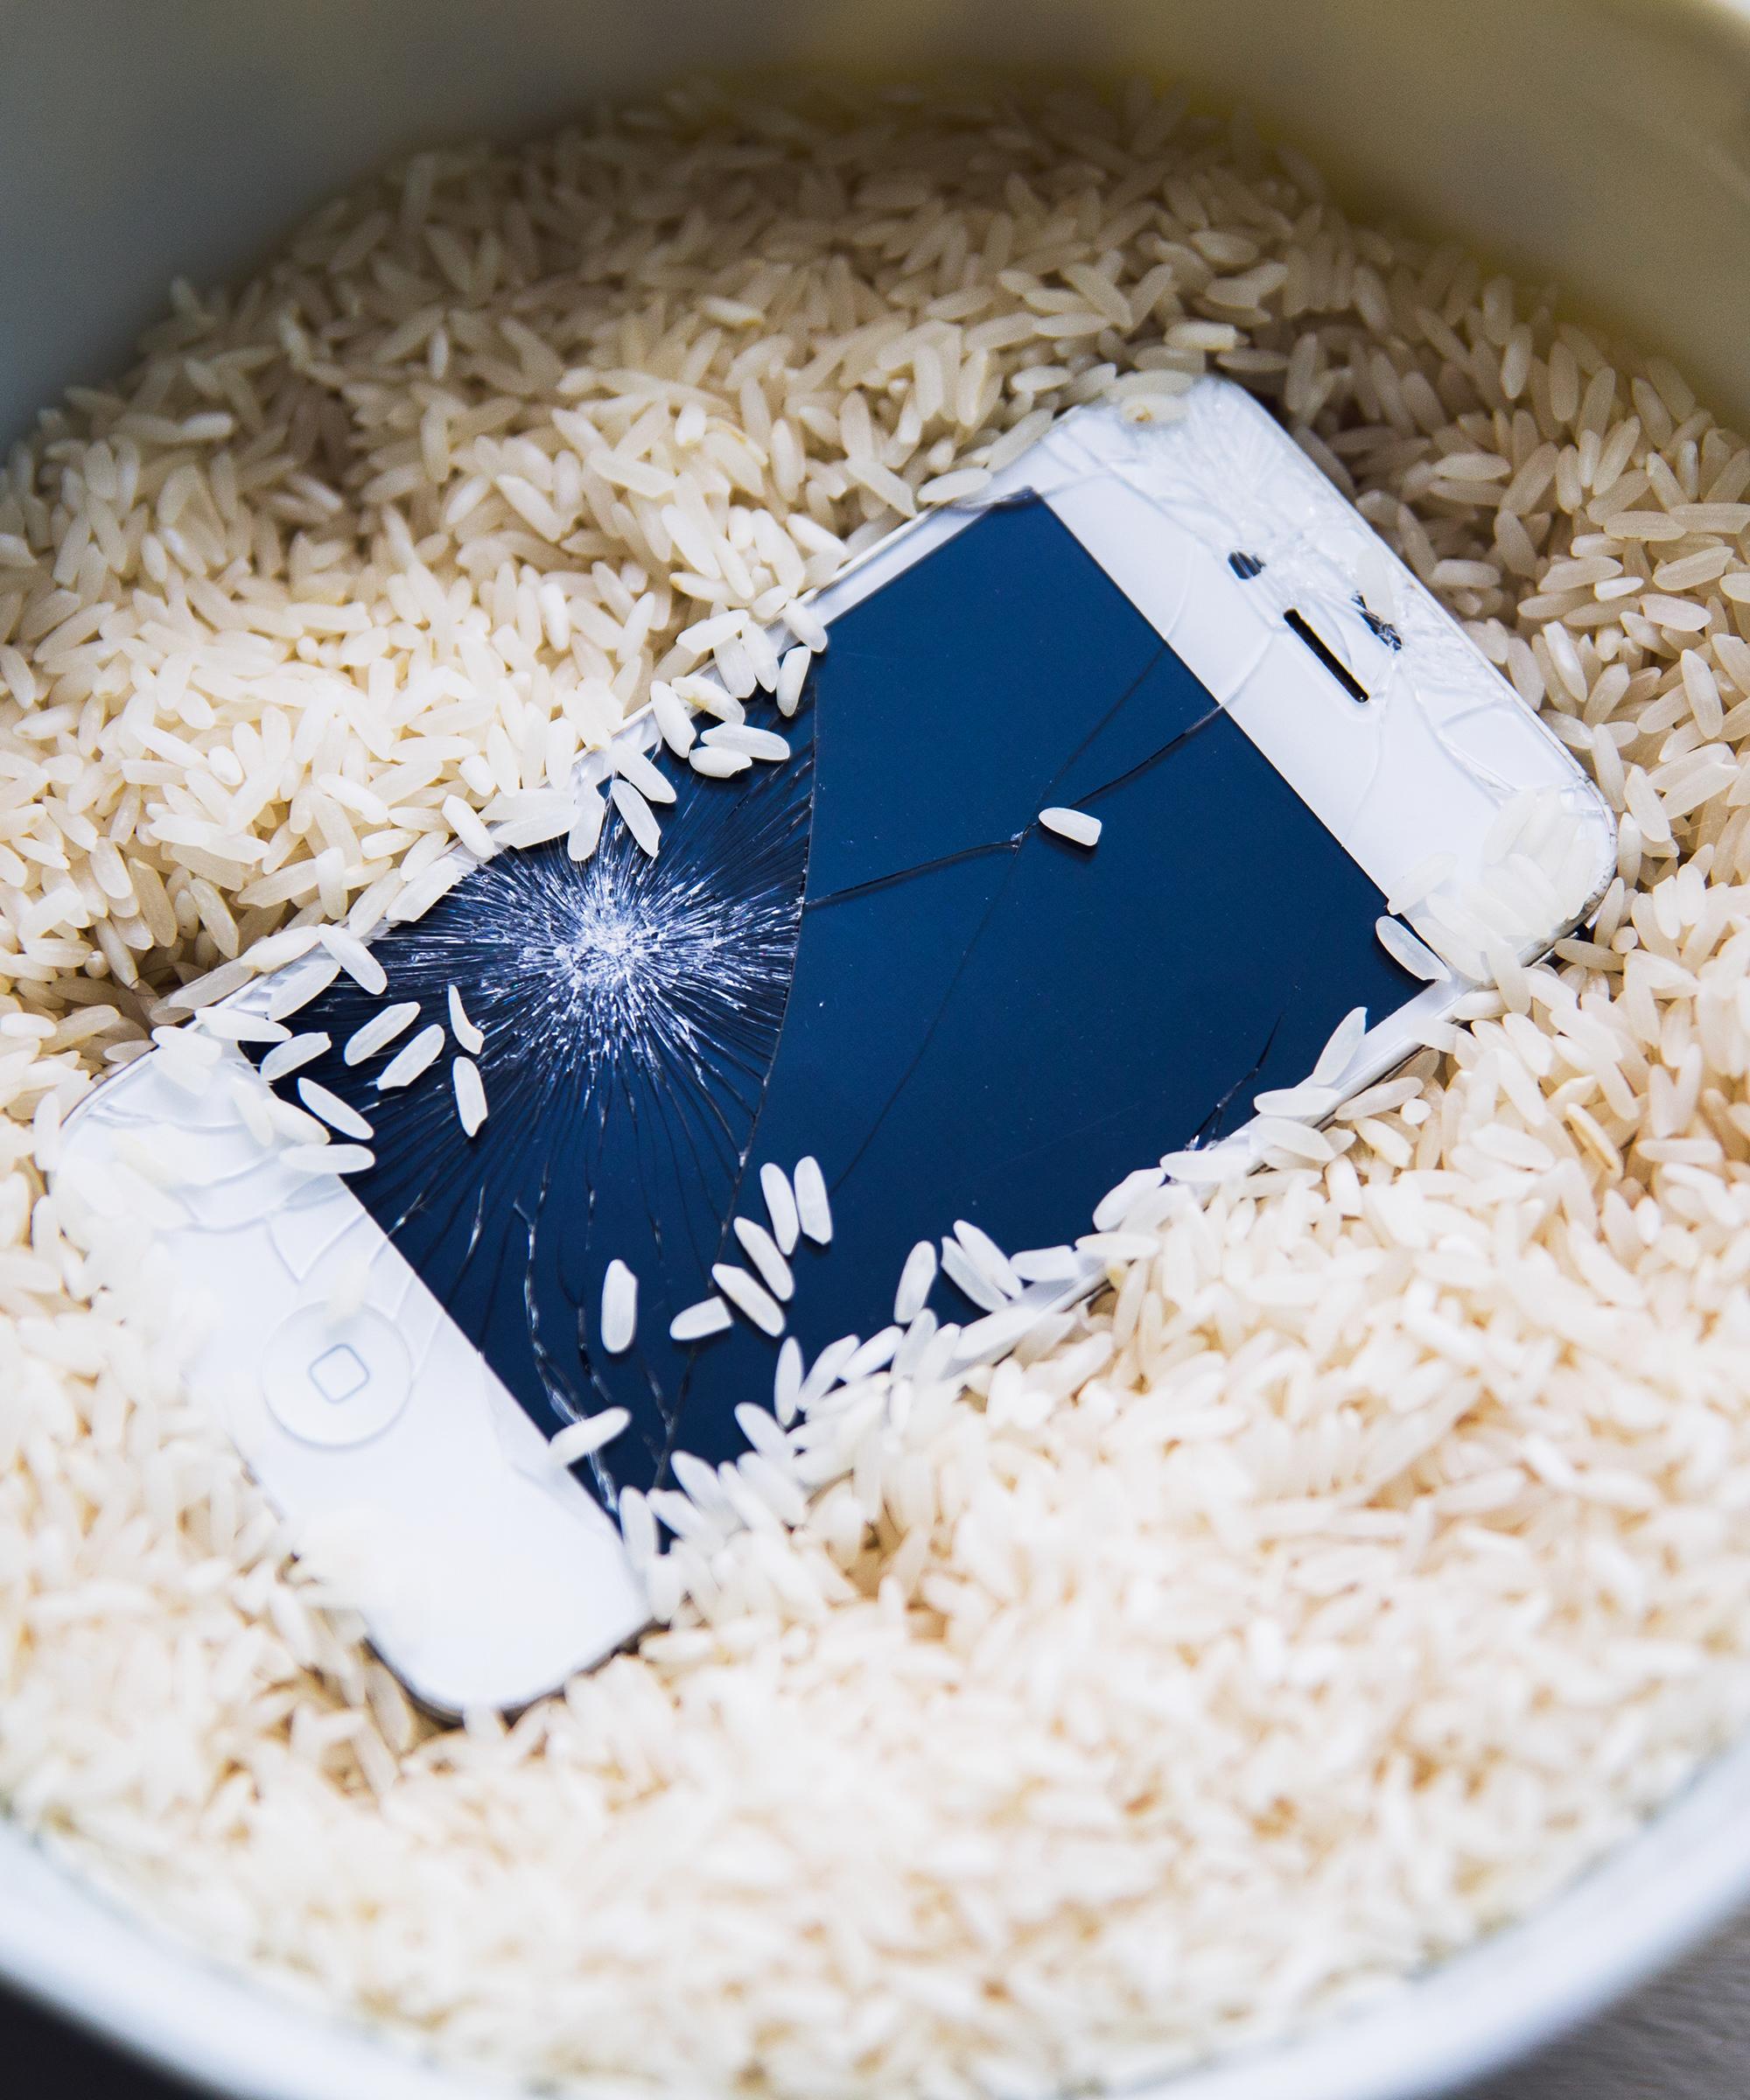 iPhone Screen Repair NYC - Where To Fix Cracked Phone